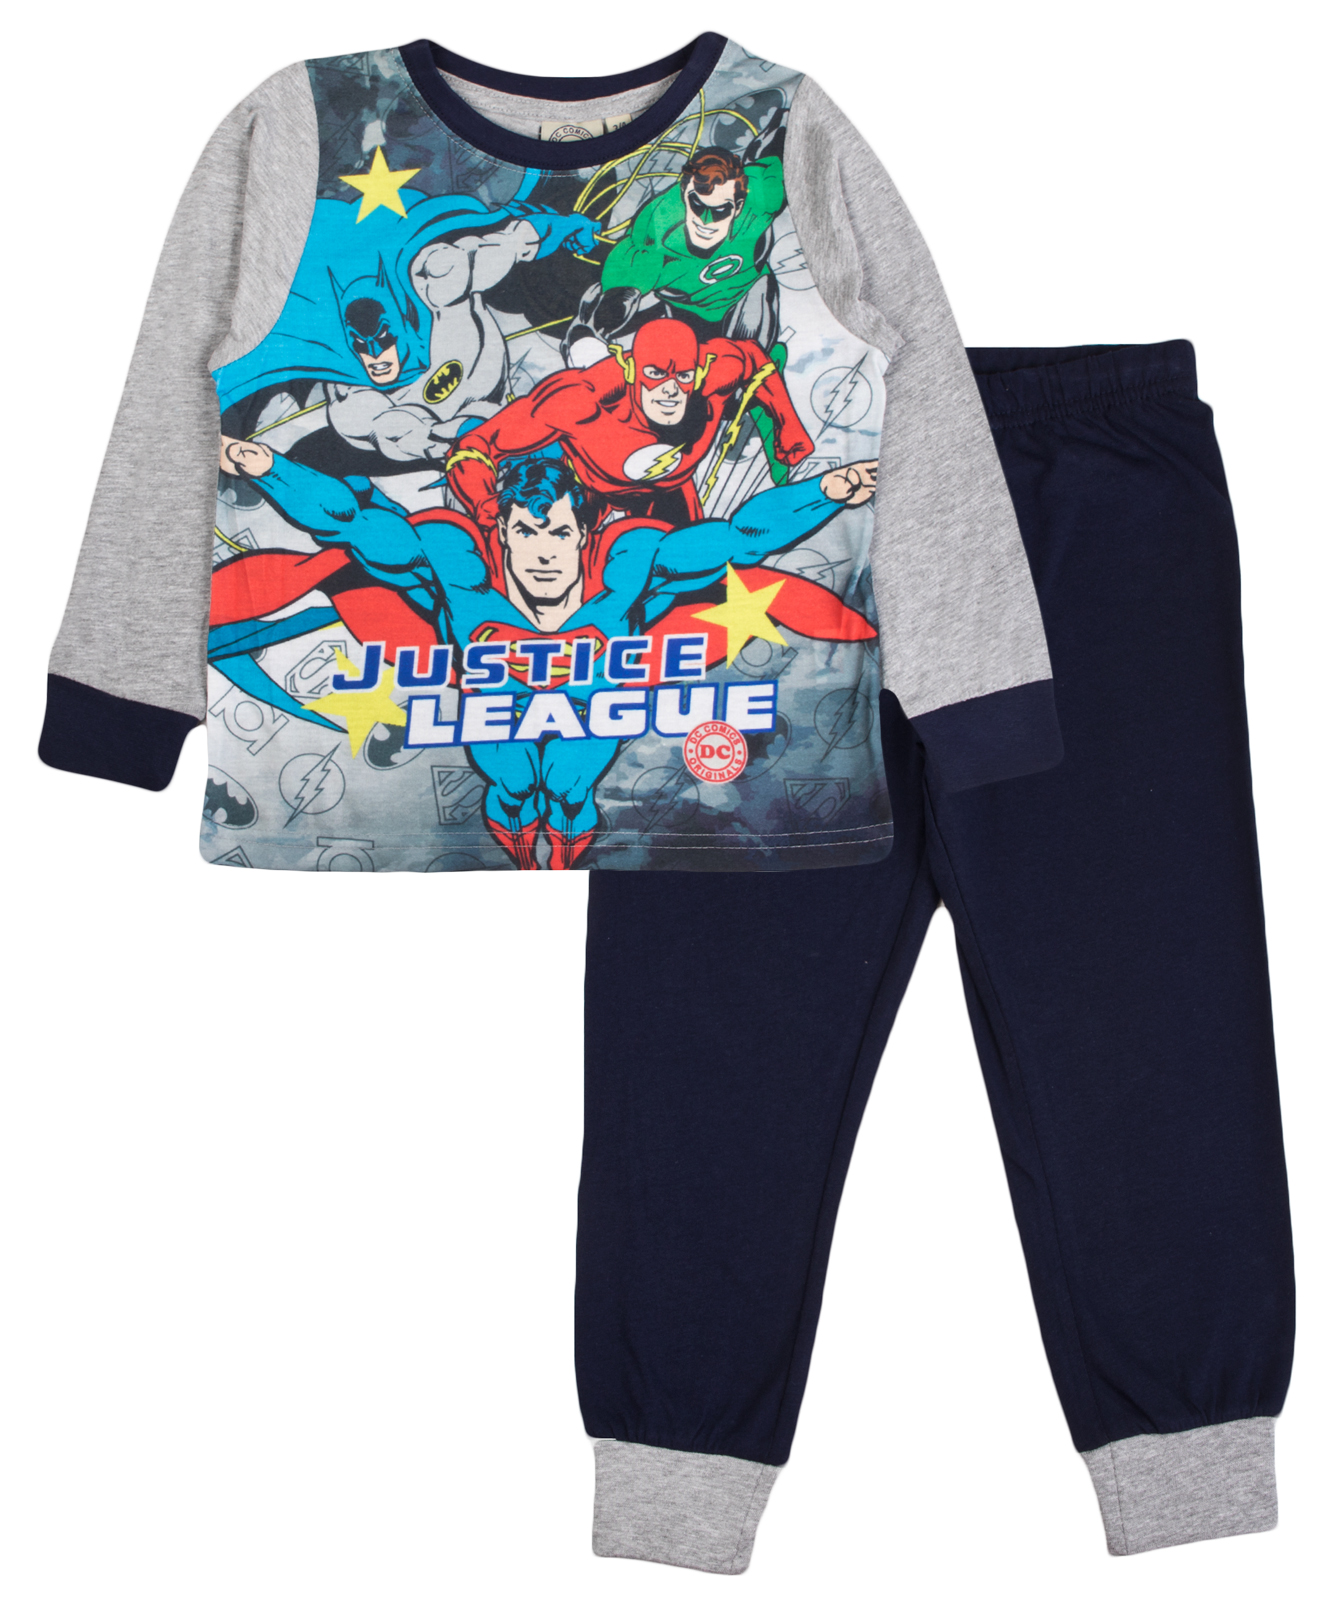 fcdb3fddddaa Boys Justice League Pyjamas Kids Superman Flash Long Pjs Kids 2 ...